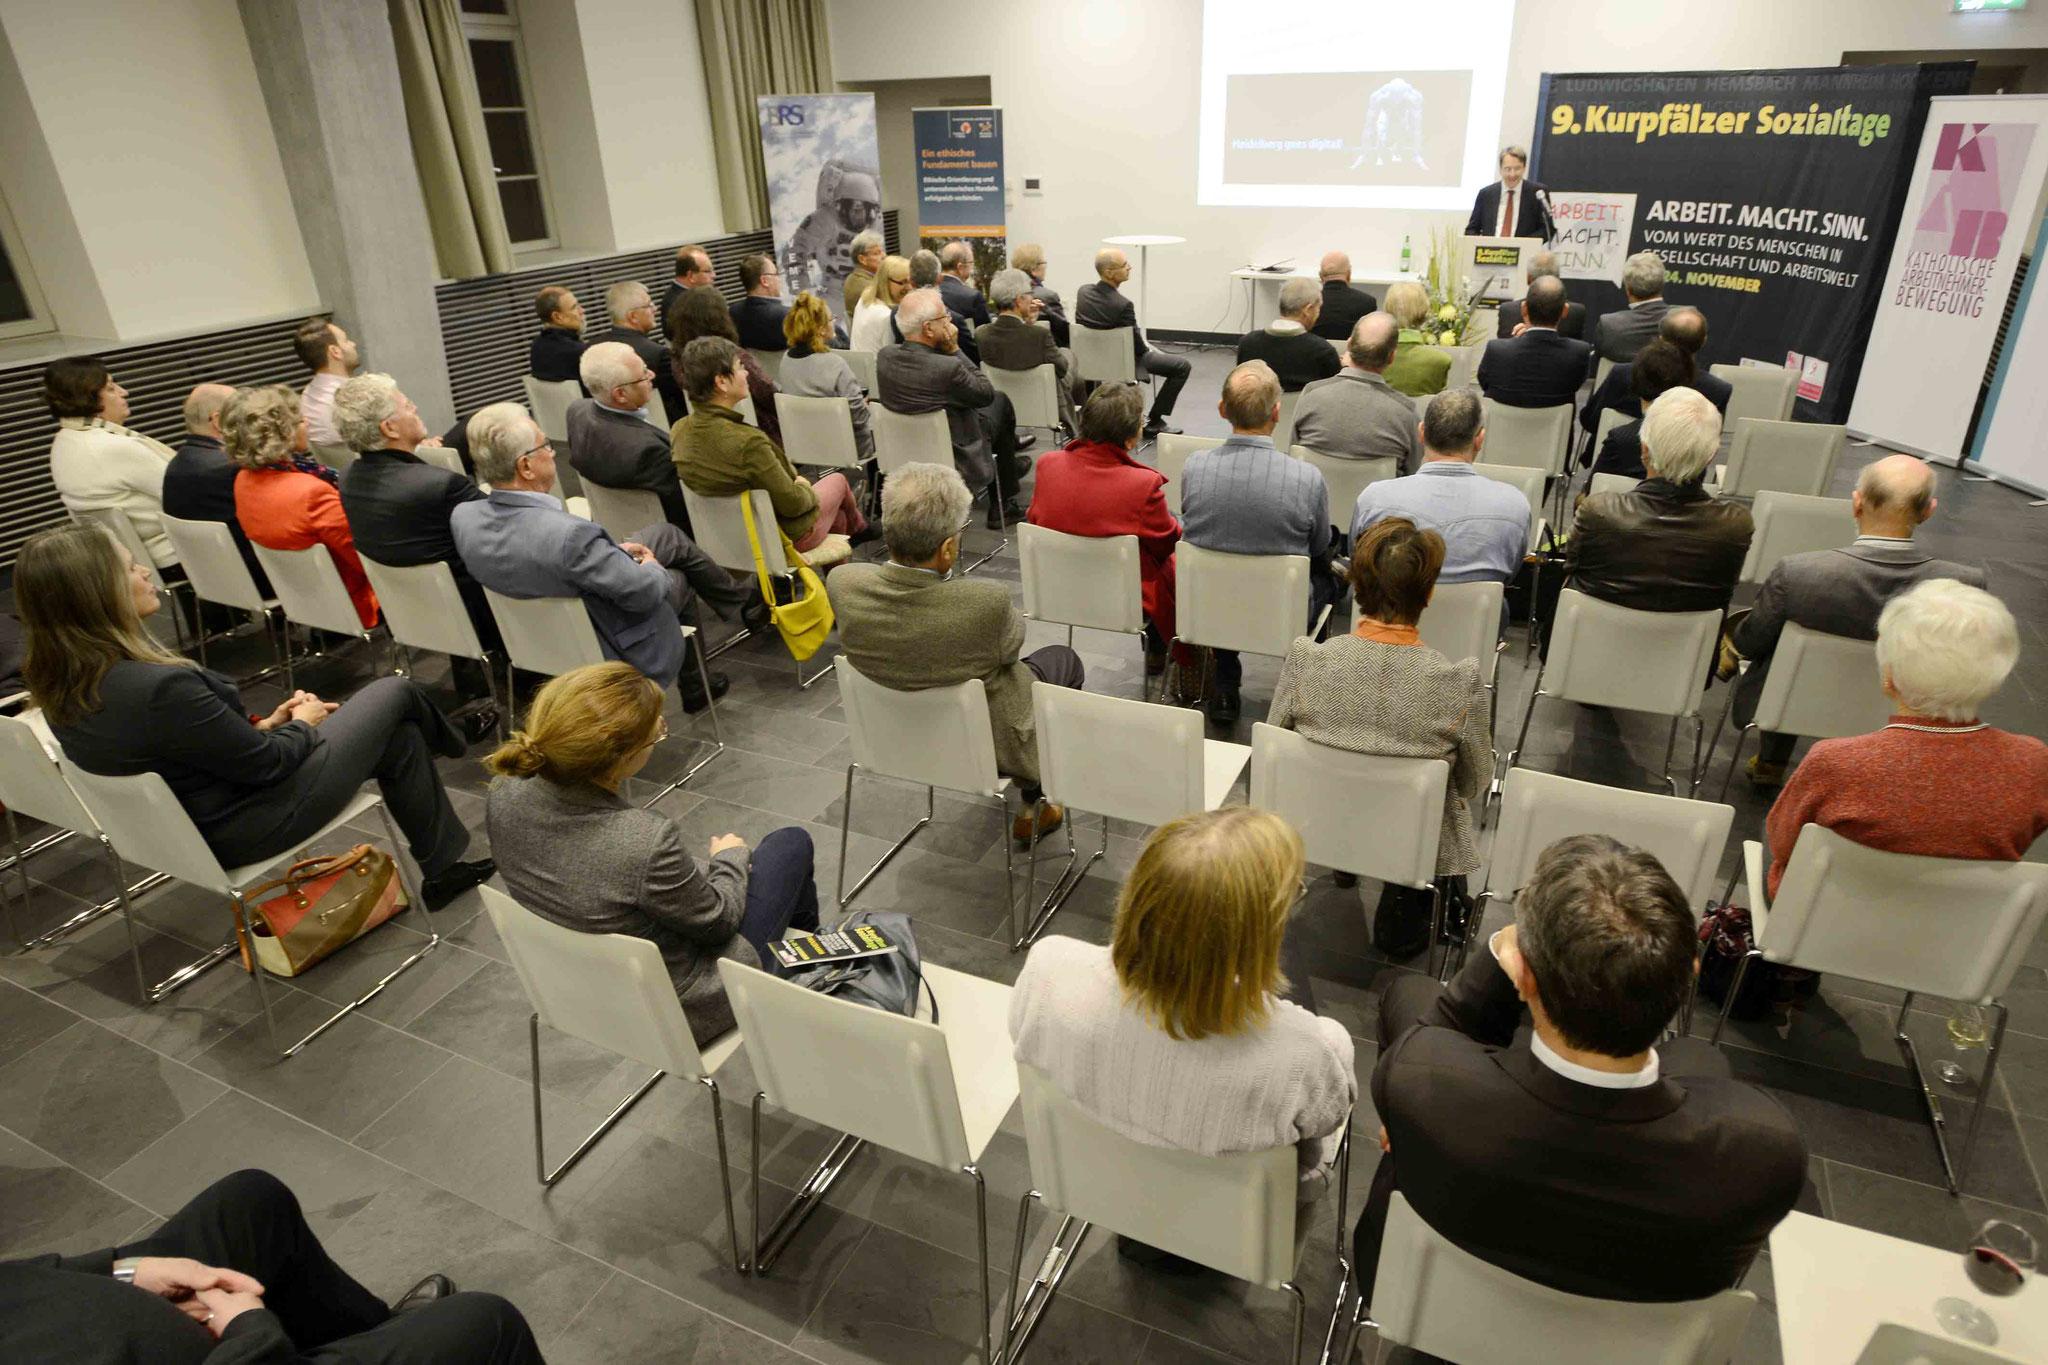 Publikum, Bild: Copyright by Helmut G. Roos